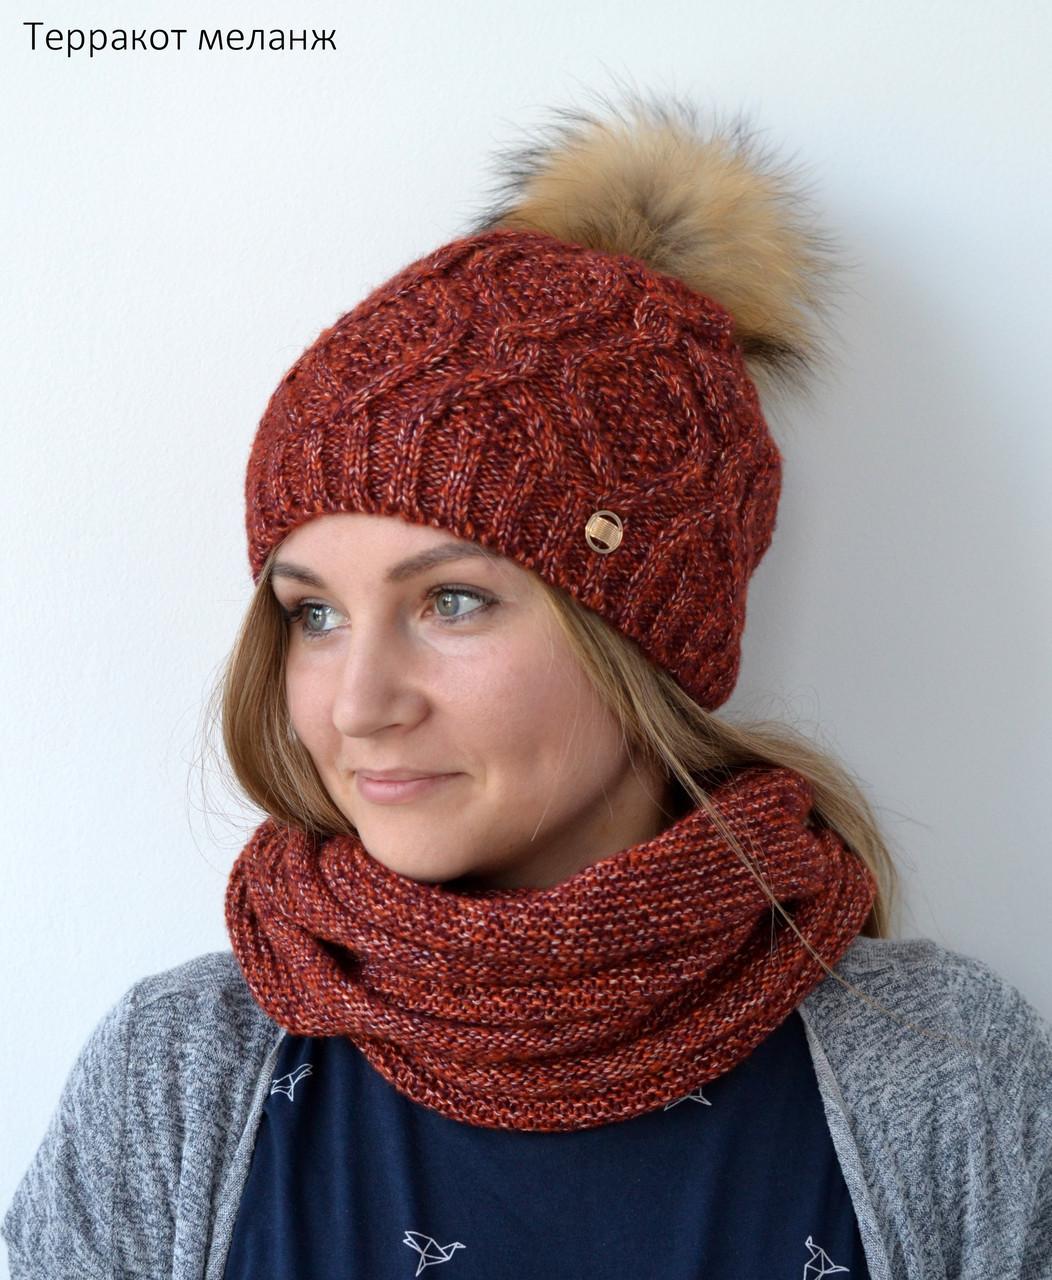 Зимова шапка жіноча в'язана 2018